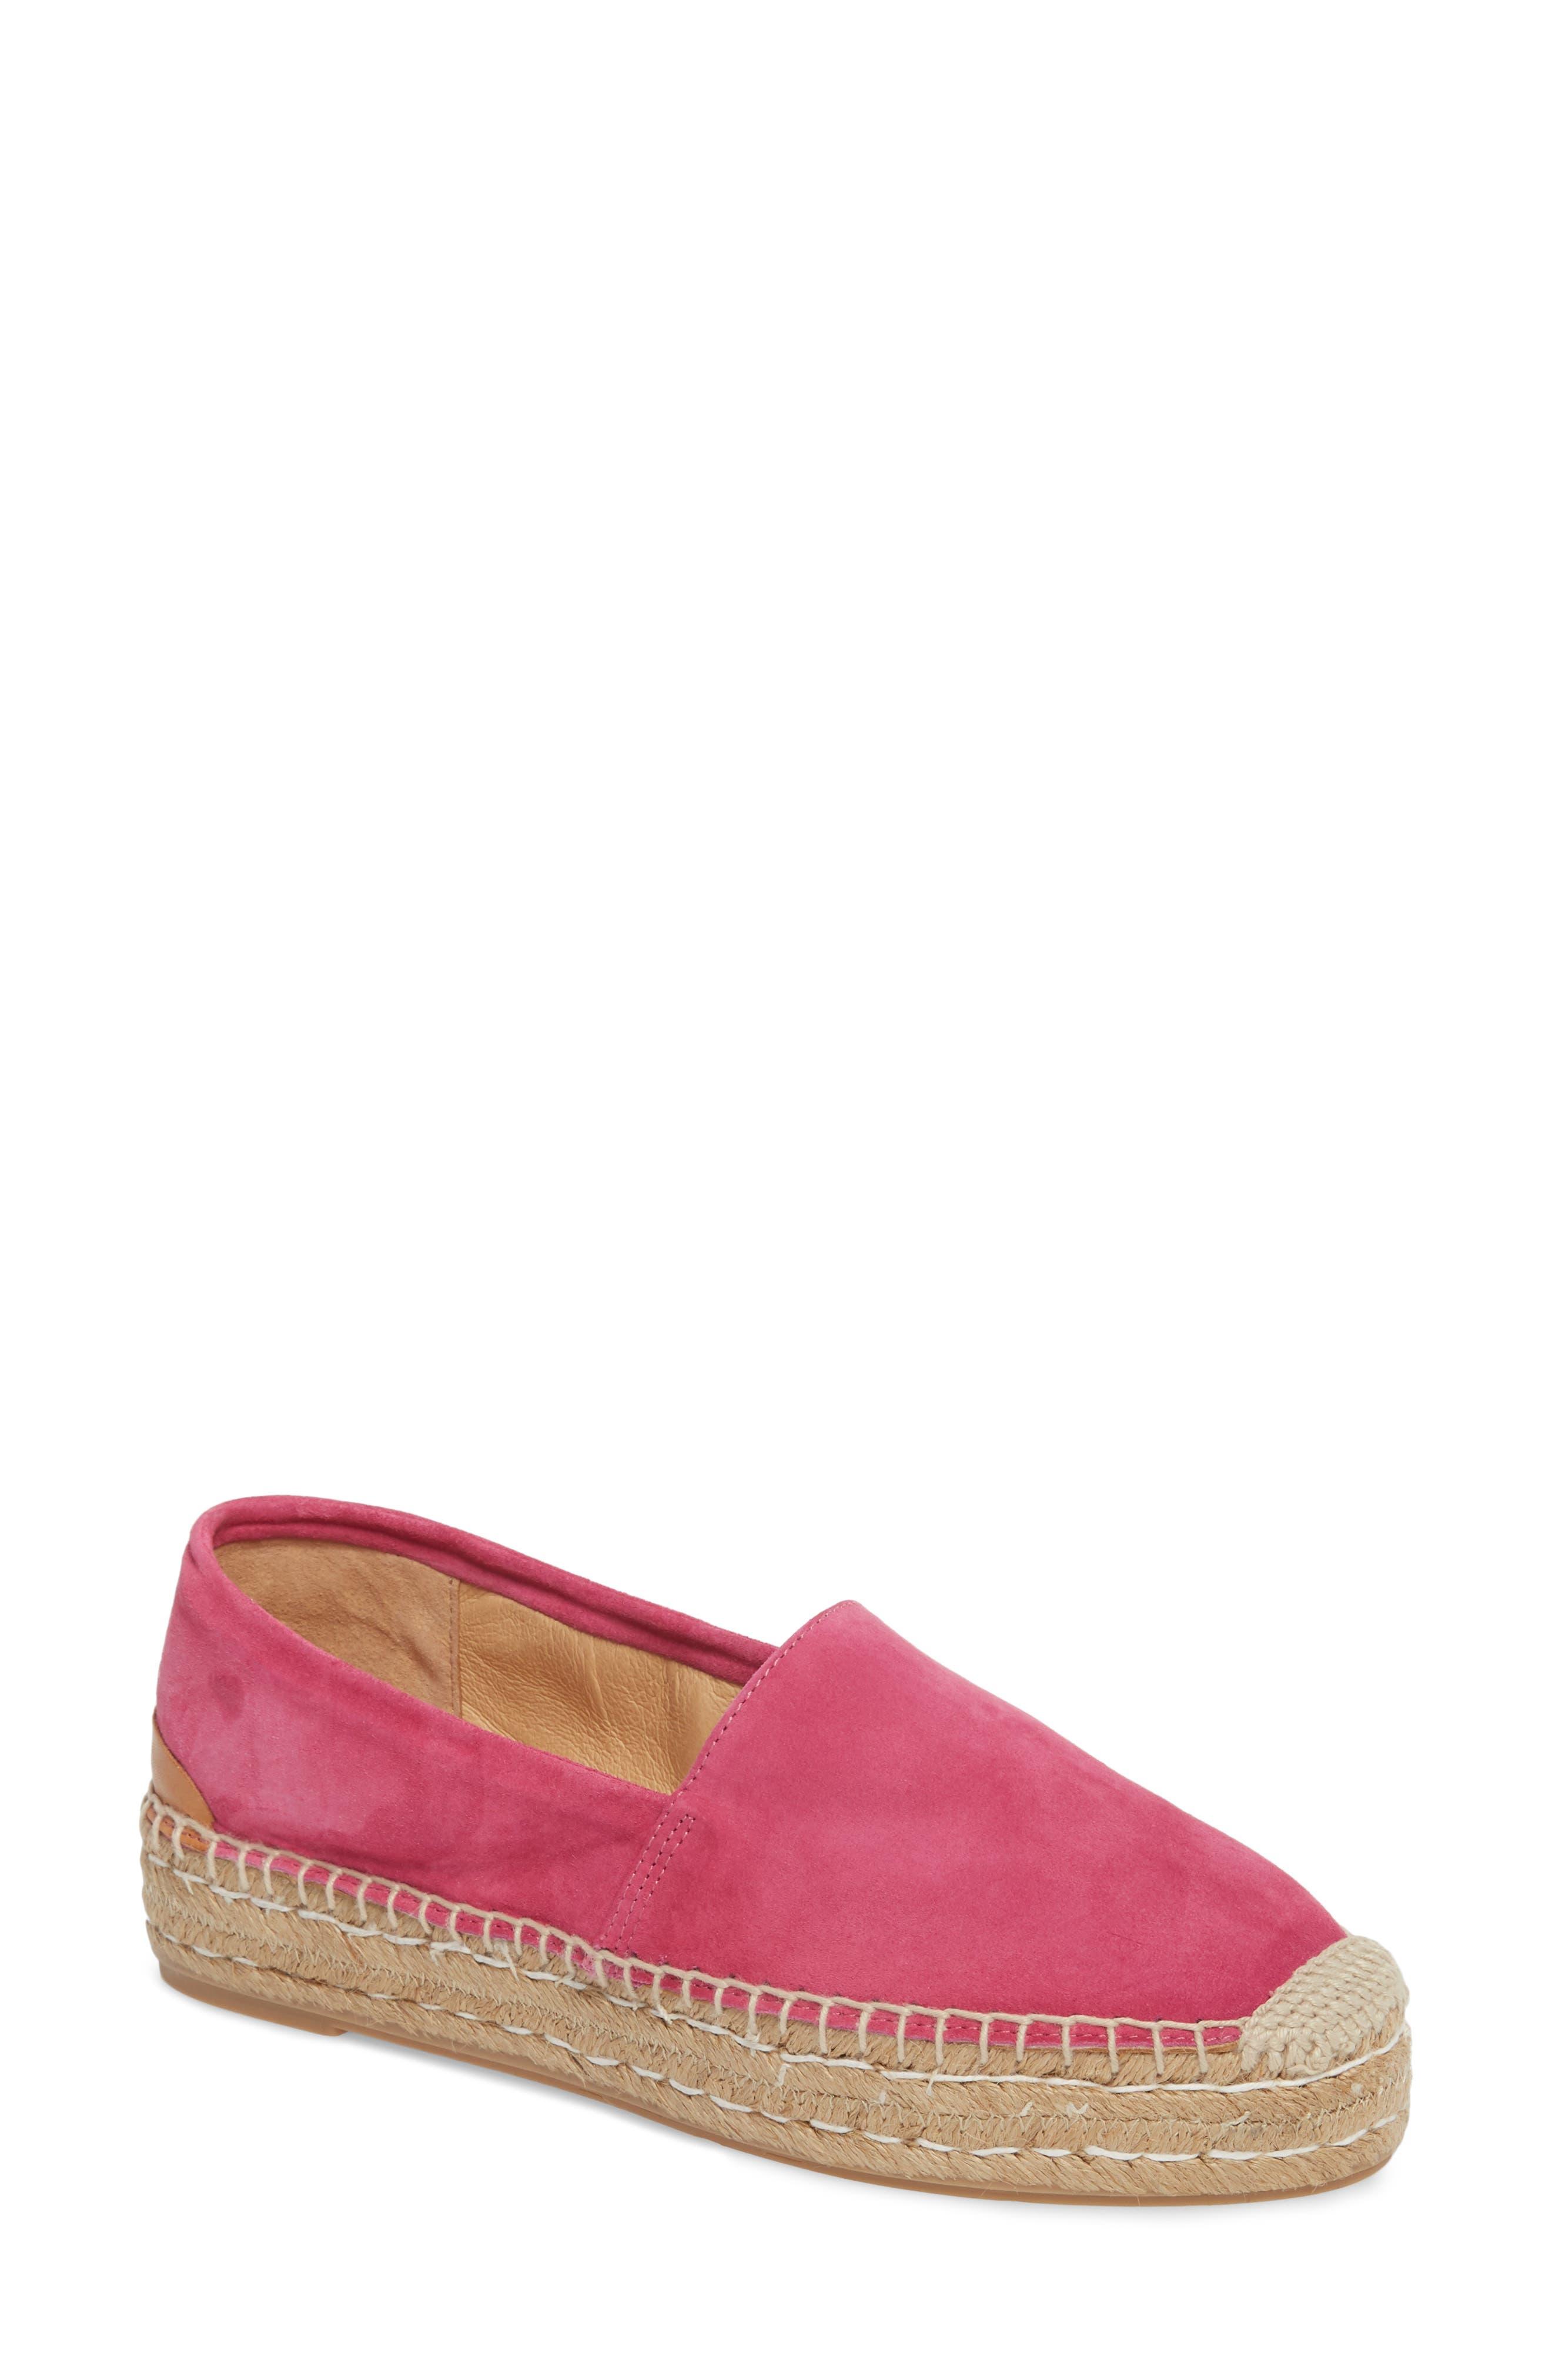 Abigail Espadrille Slip-On,                             Main thumbnail 1, color,                             Hot Pink Suede